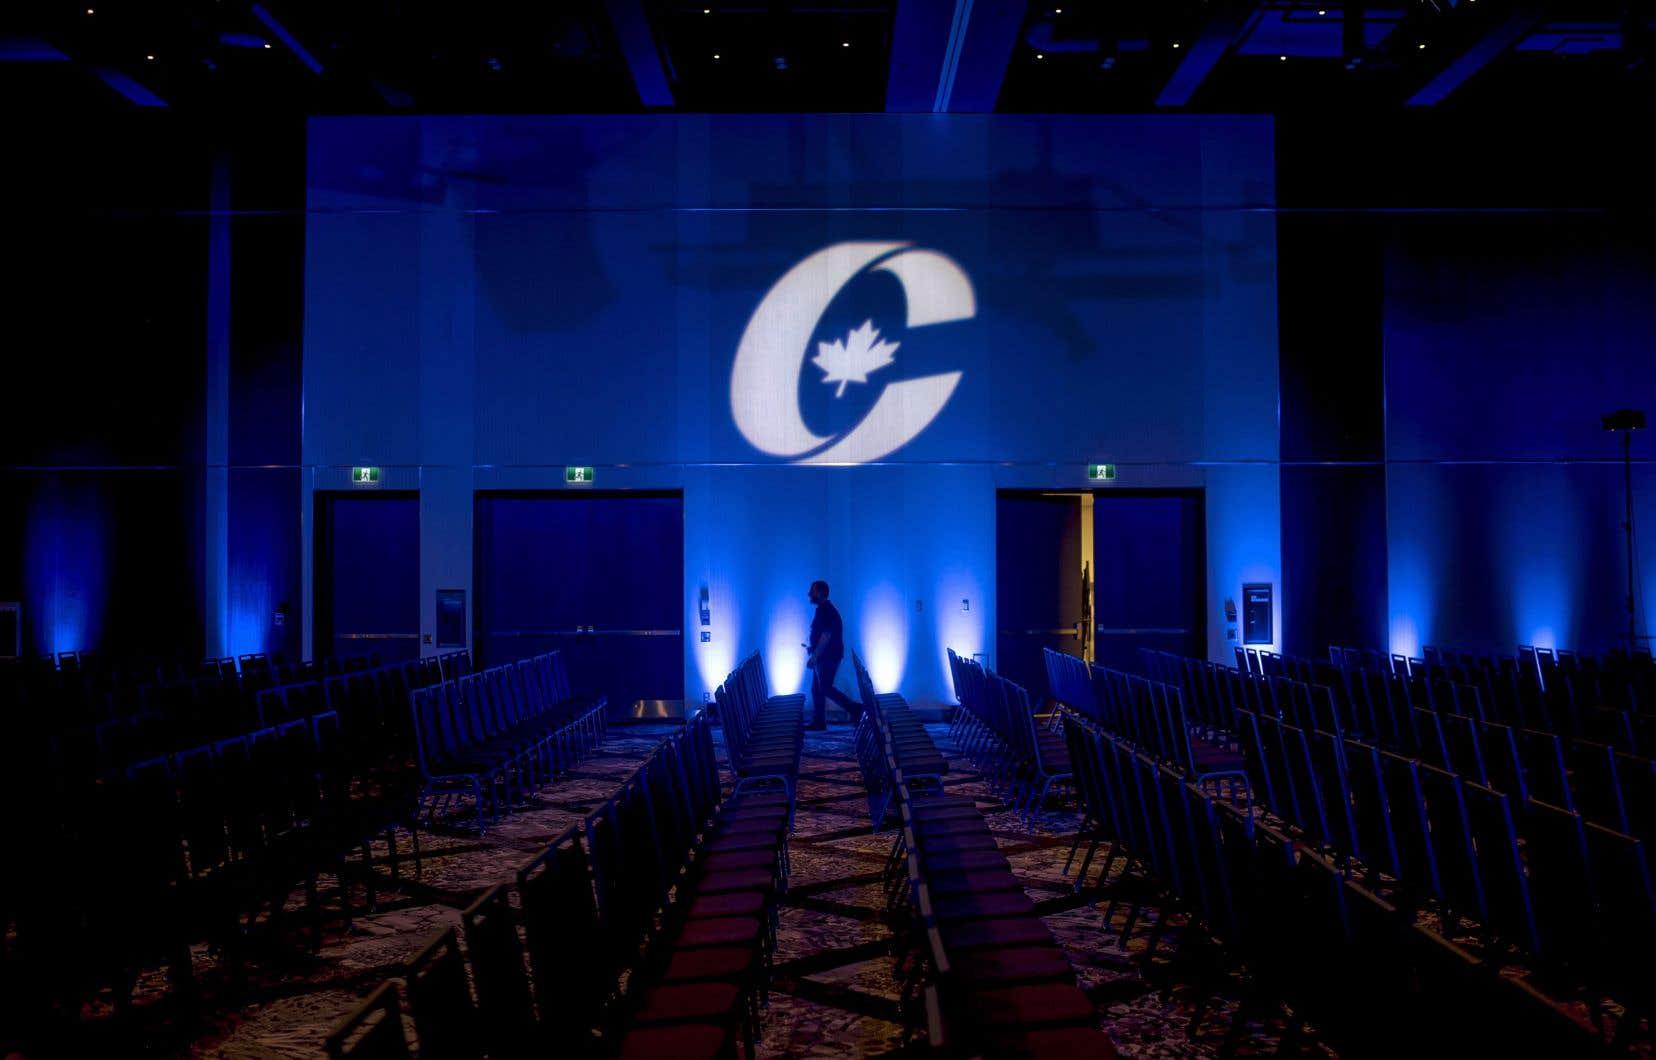 On saura dimanche qui succédera à Andrew Scheer pour affronter Justin Trudeau lors du prochain scrutin.